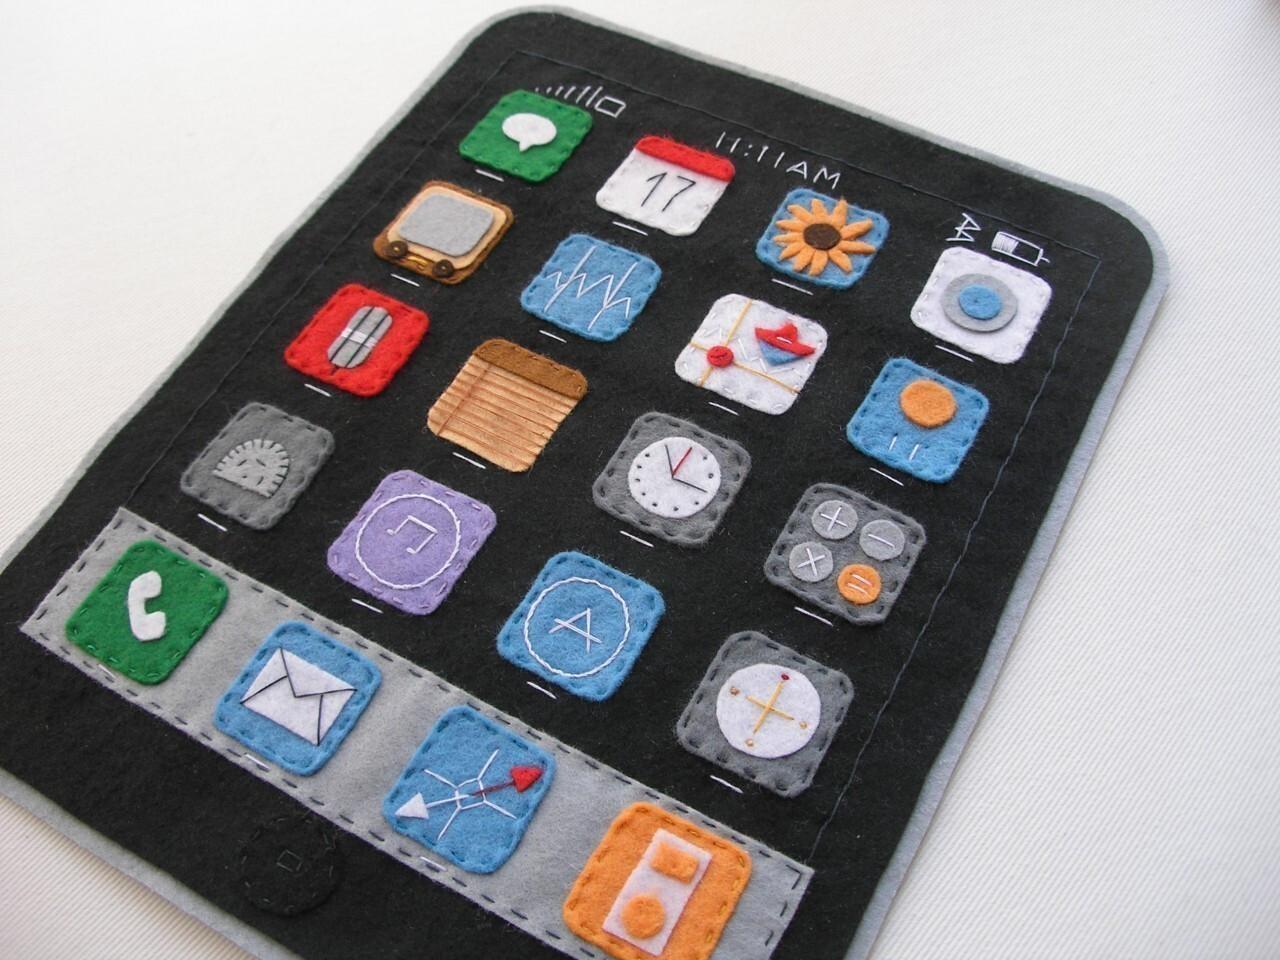 Felt iPad mini case - $49